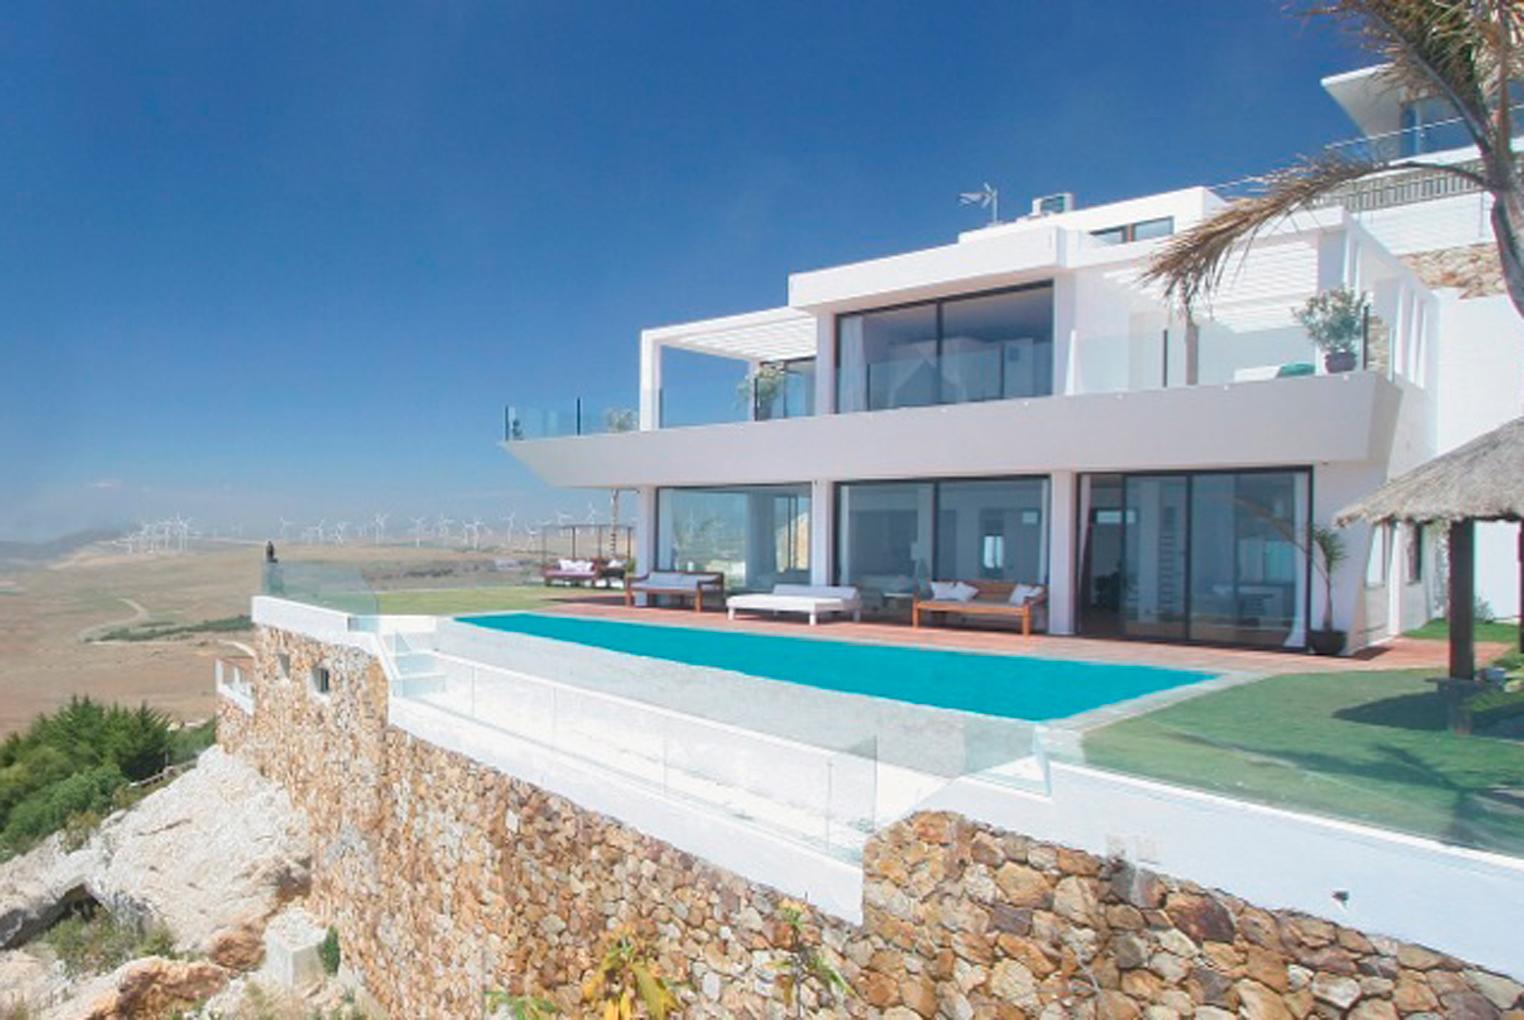 Con vistas al mar fashion south for Casas con piscina zahara delos atunes